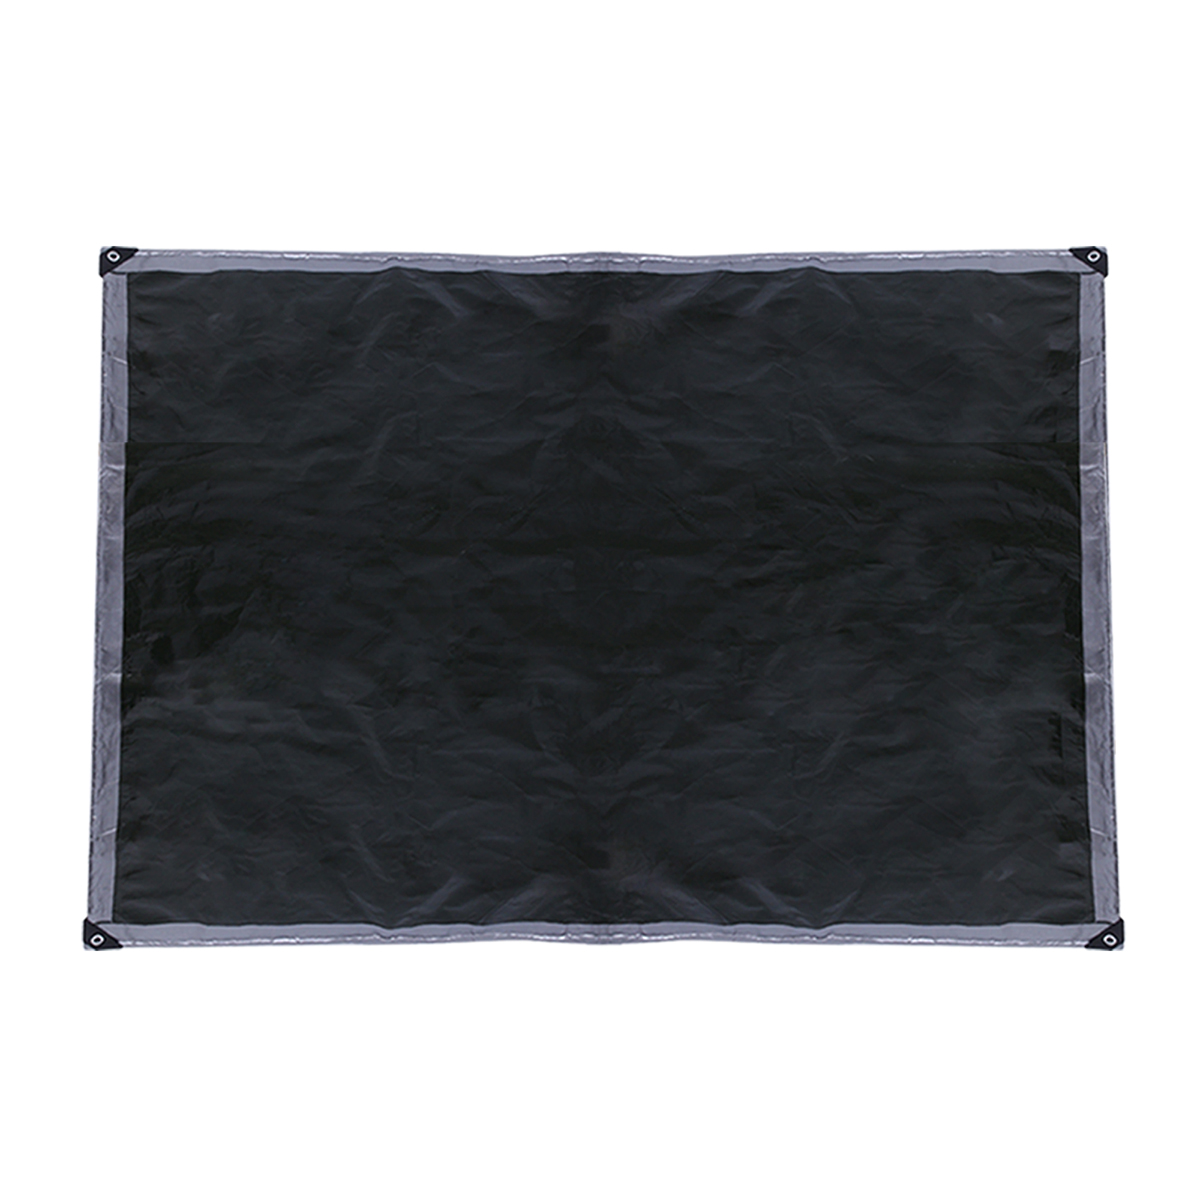 Heavy Duty Poly Tarps PE Farm Tarpaulin Camping Cover UV Water Rot Proof Tent Sunshade